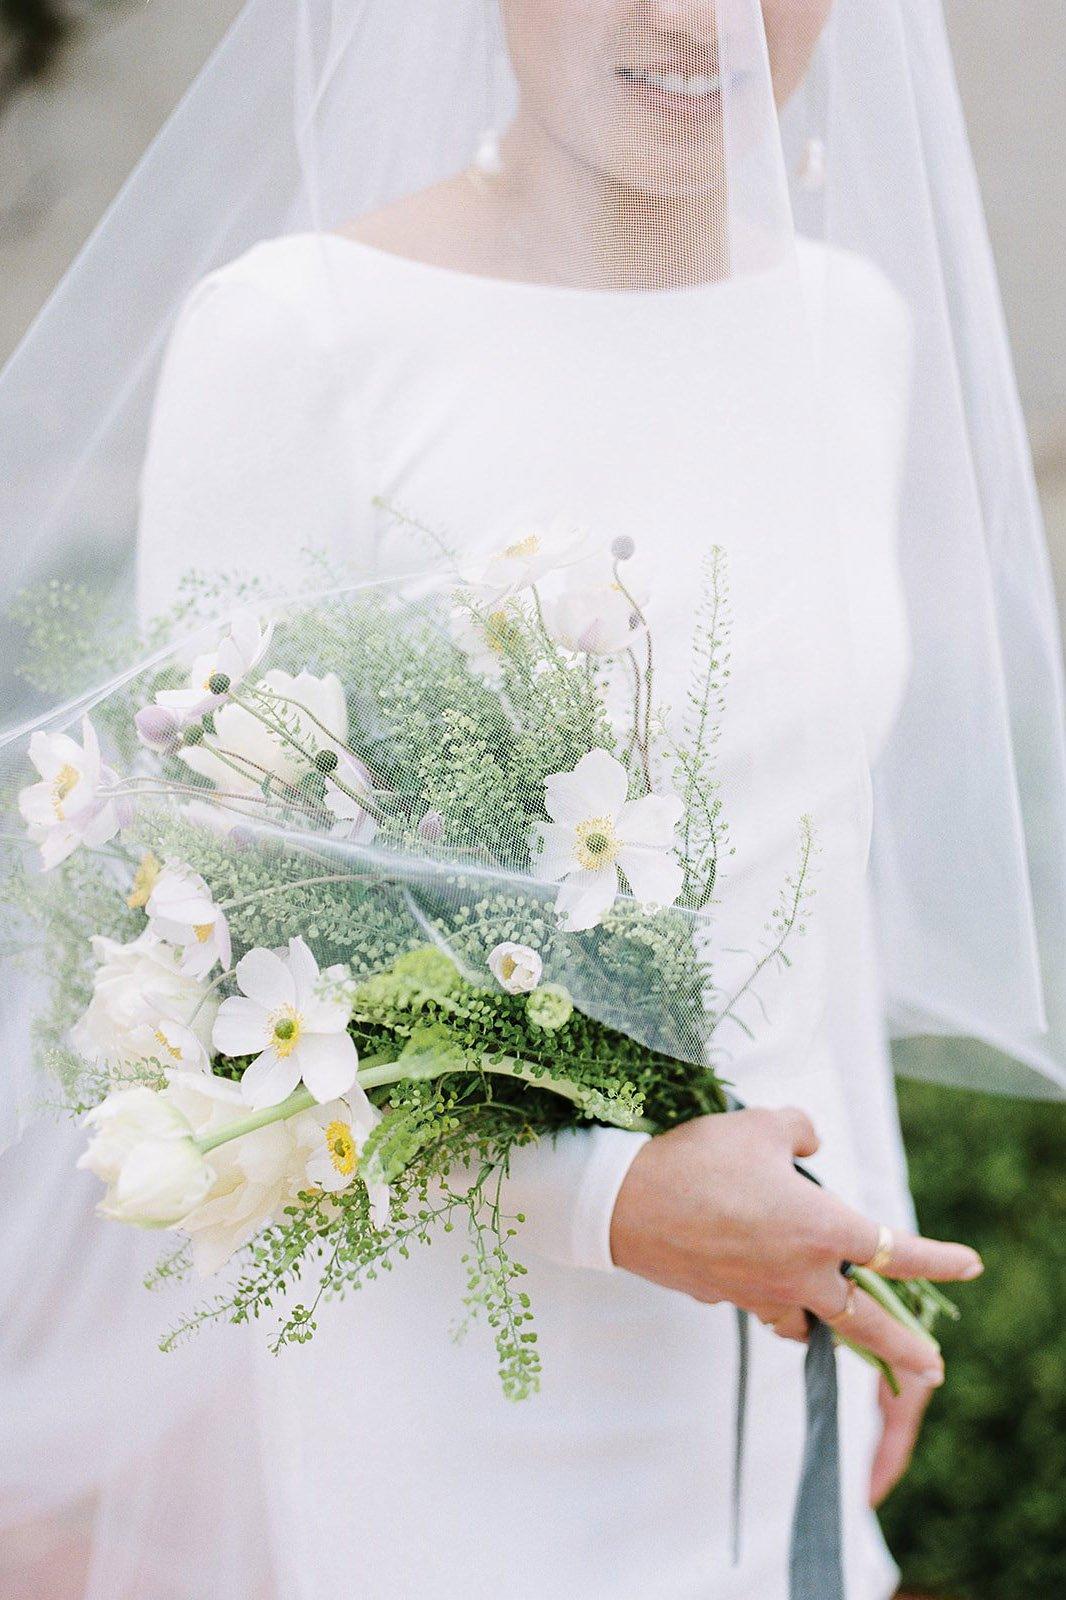 Elise + Zach - Loire Valley France Wedding Day 2